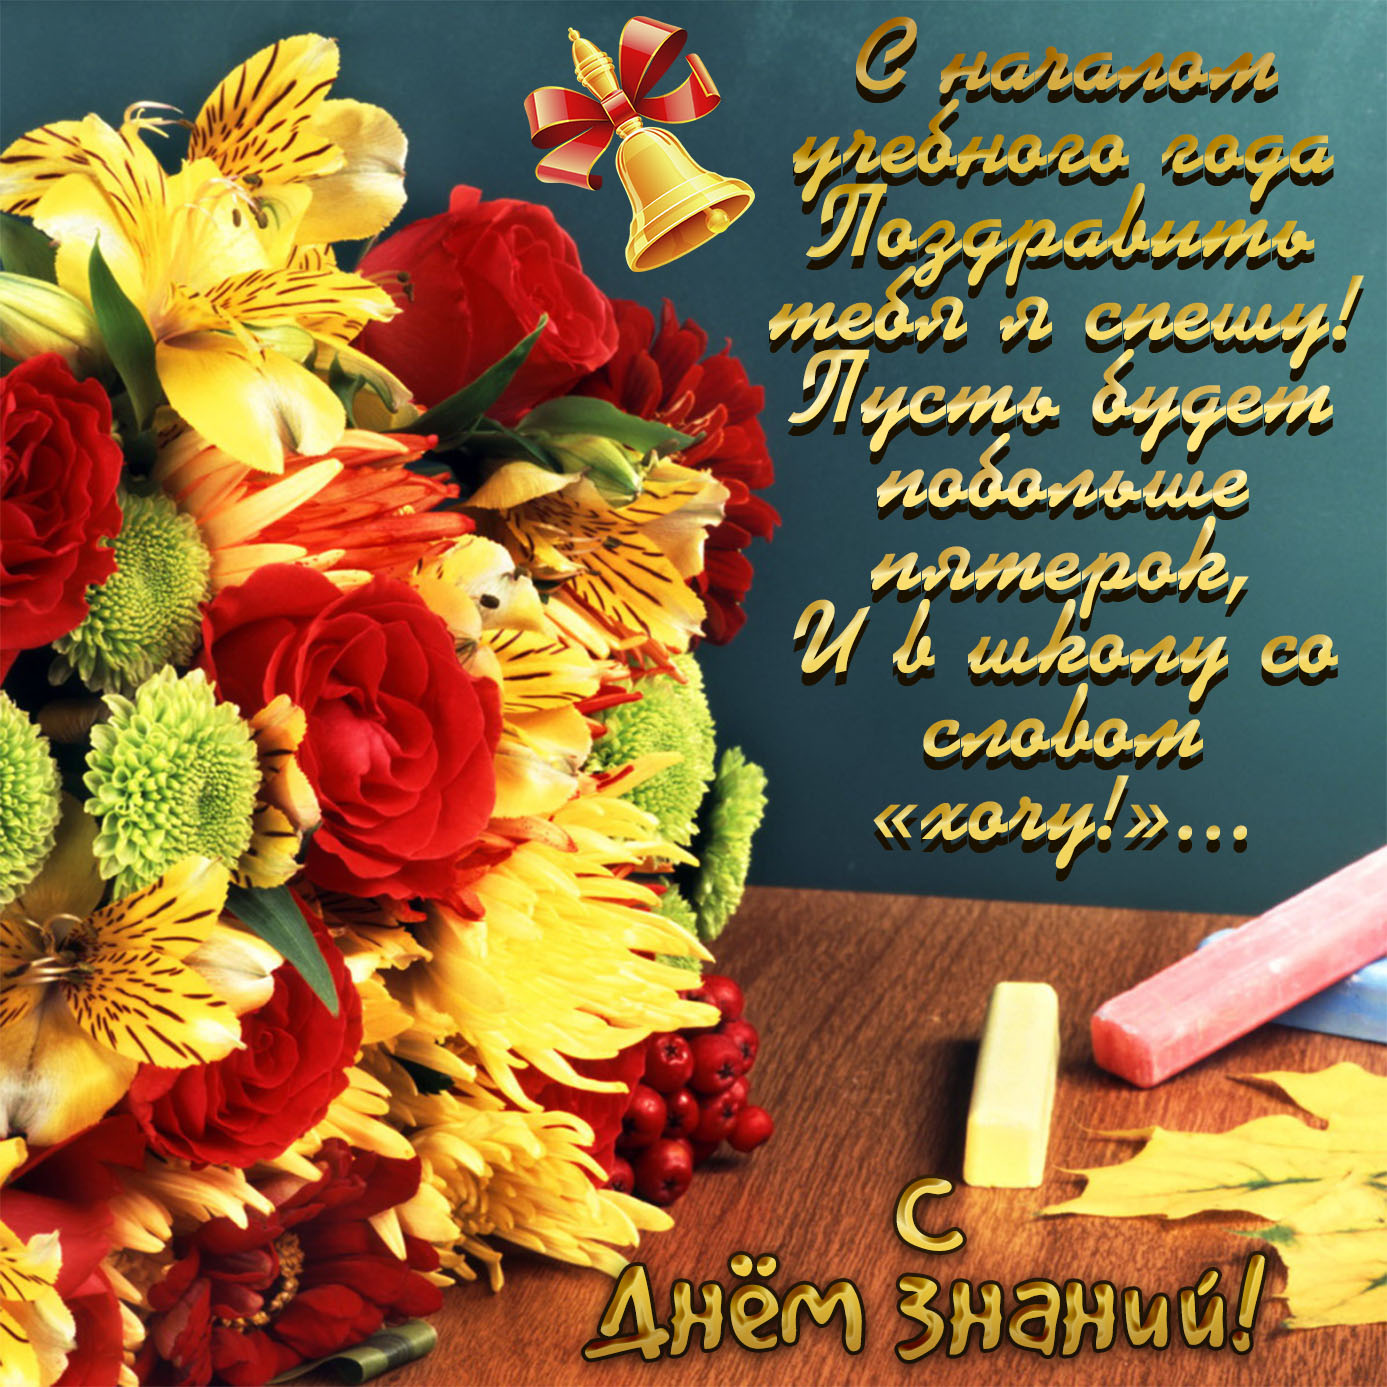 Картинка с букетом цветов на День знаний